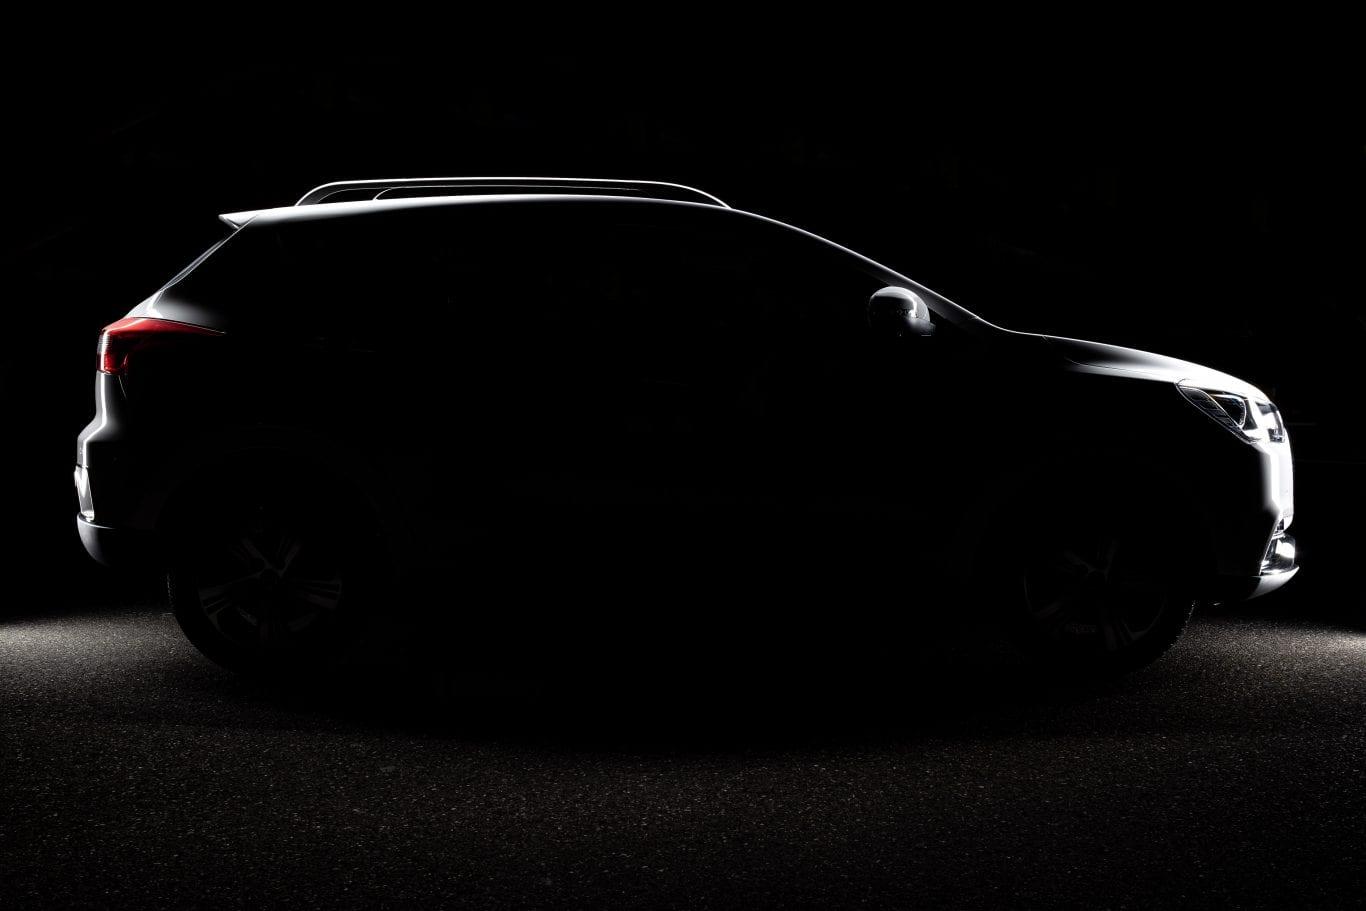 JAC – Auto Kunz ist offiziell neuer Generalimporteur - Auto Kunz AG 10